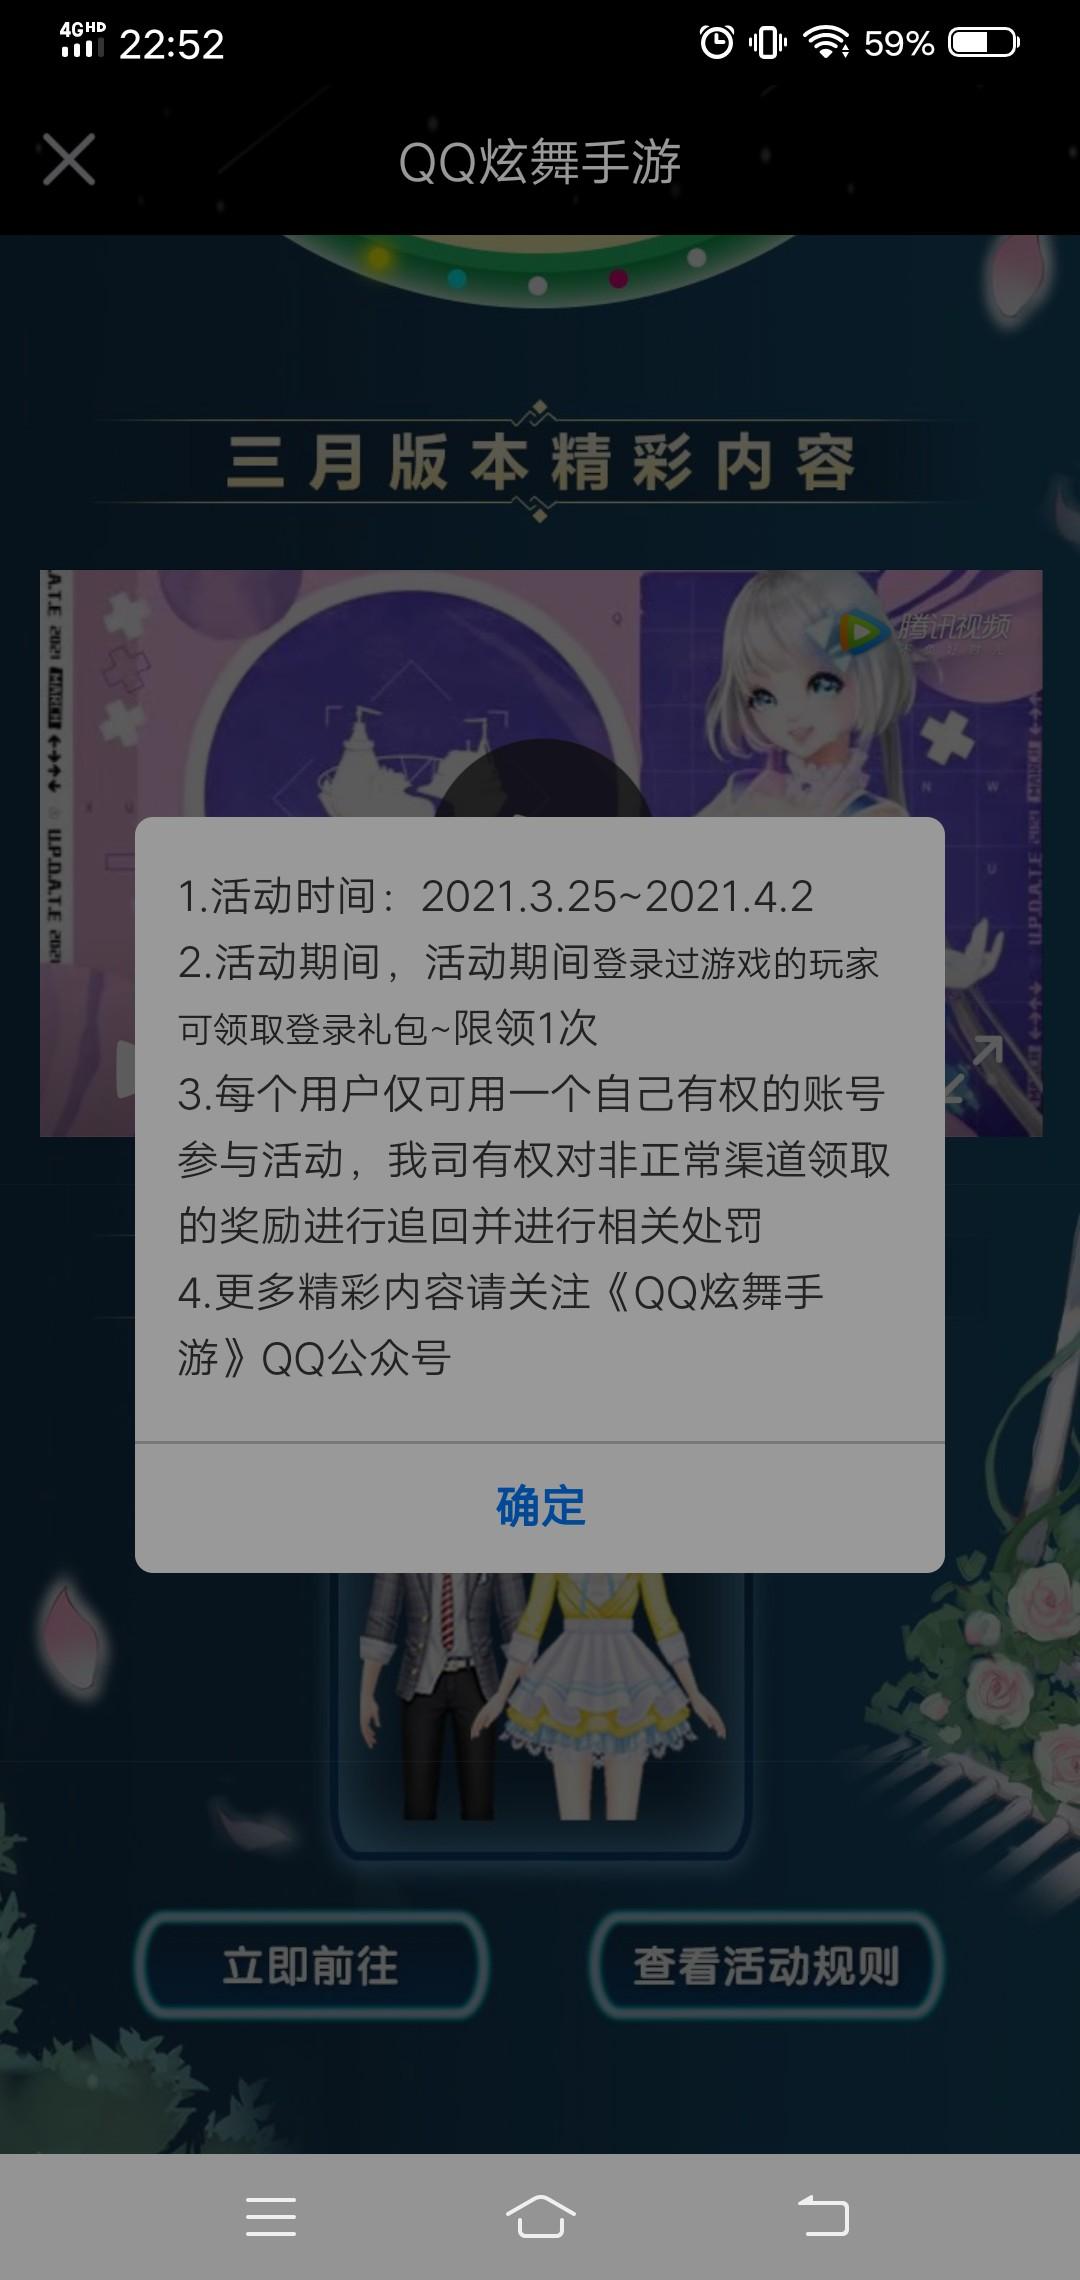 QQ炫舞登录领红包